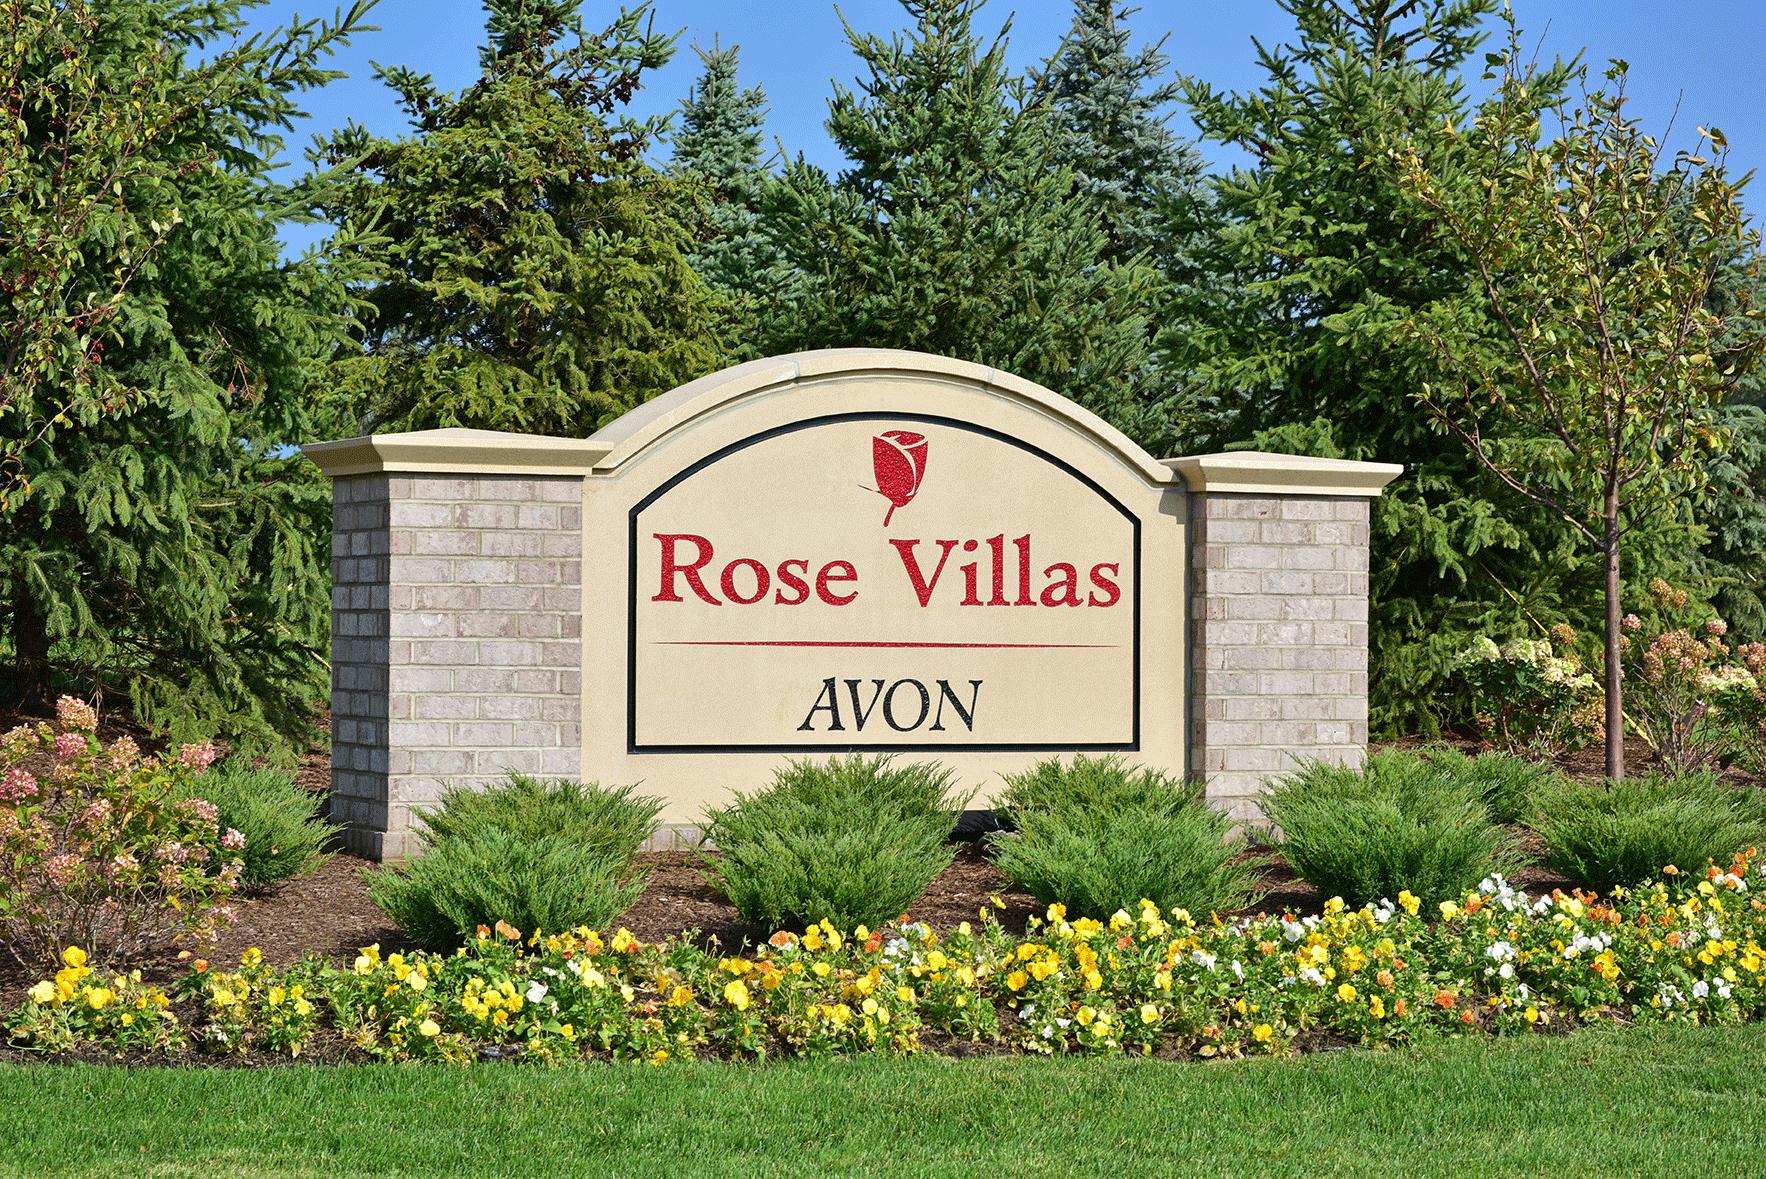 Rose Villas - Avon